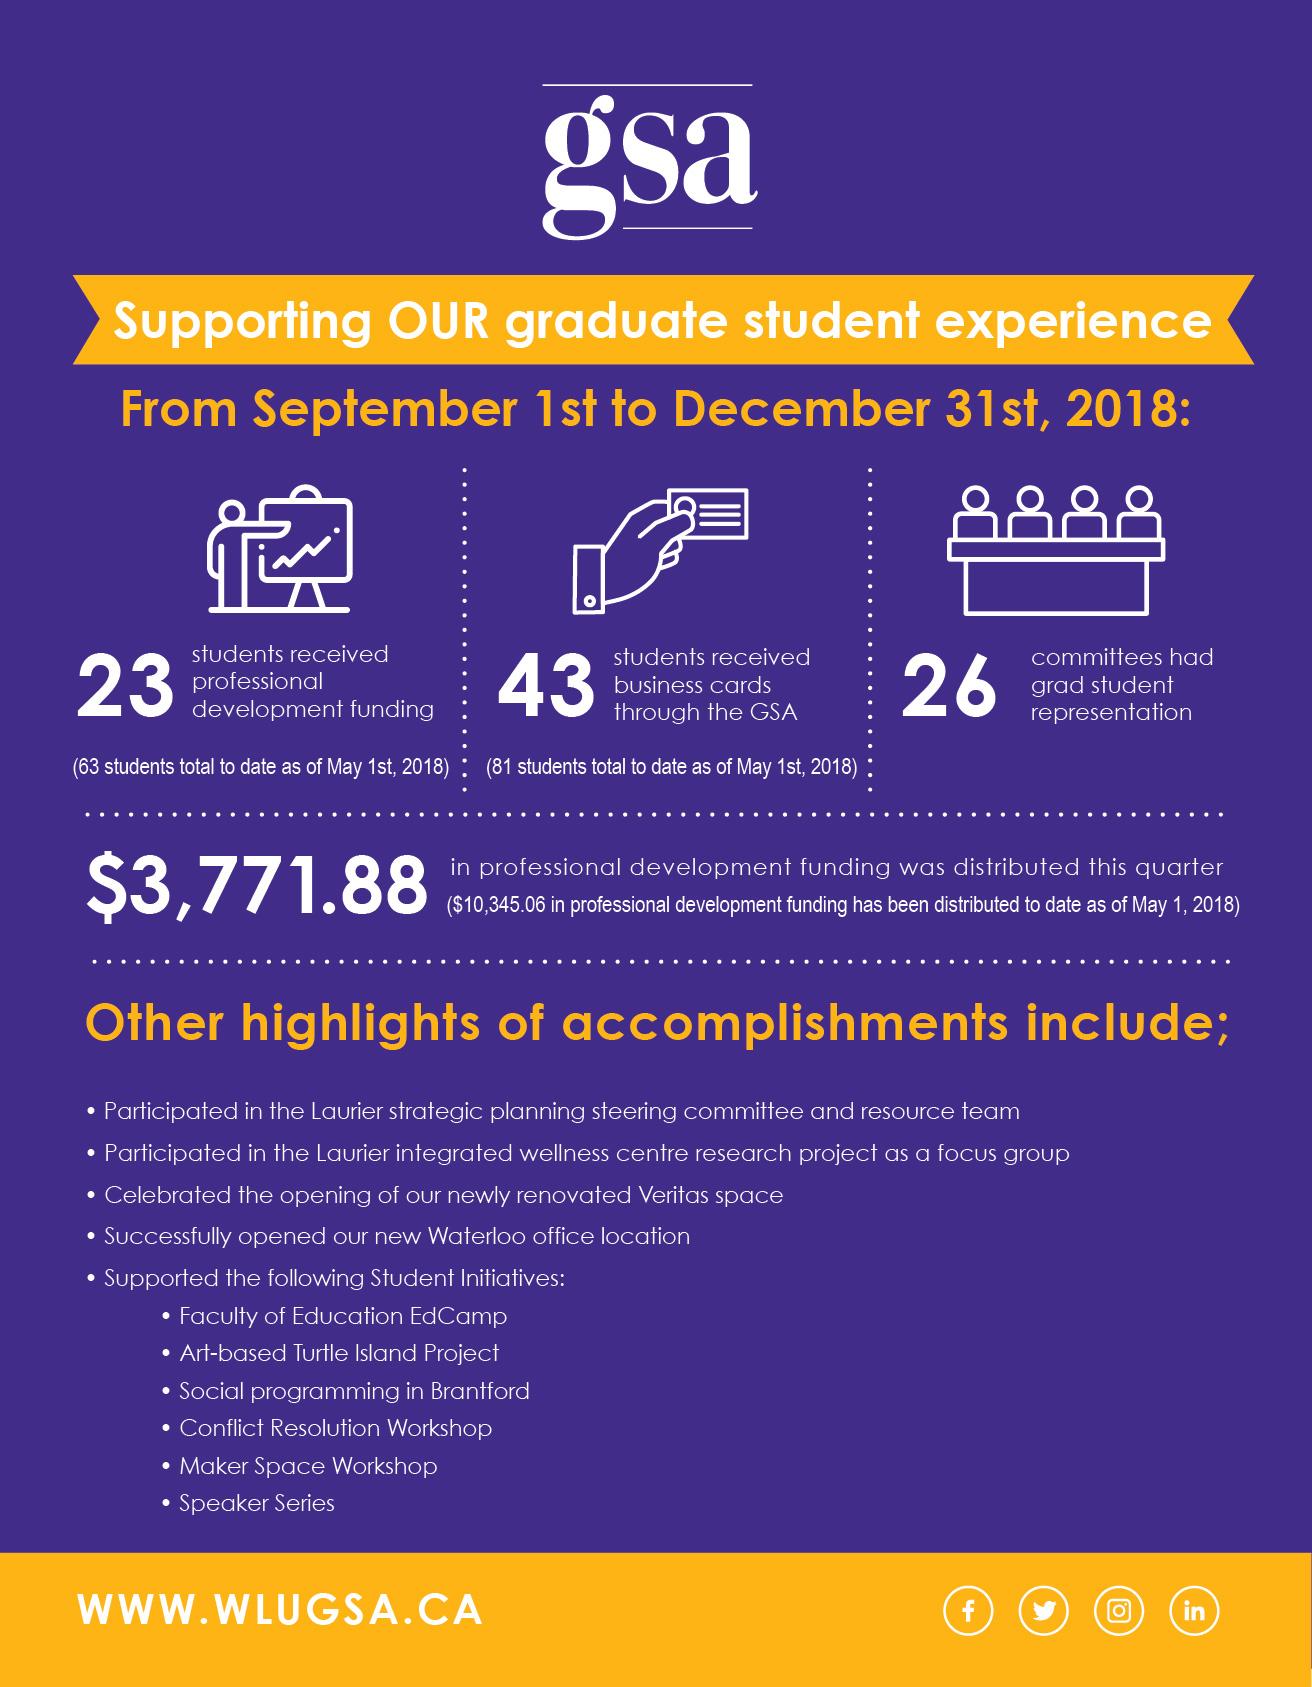 GSA Quarterly Report from September 1, 2018 to December 31, 2018.